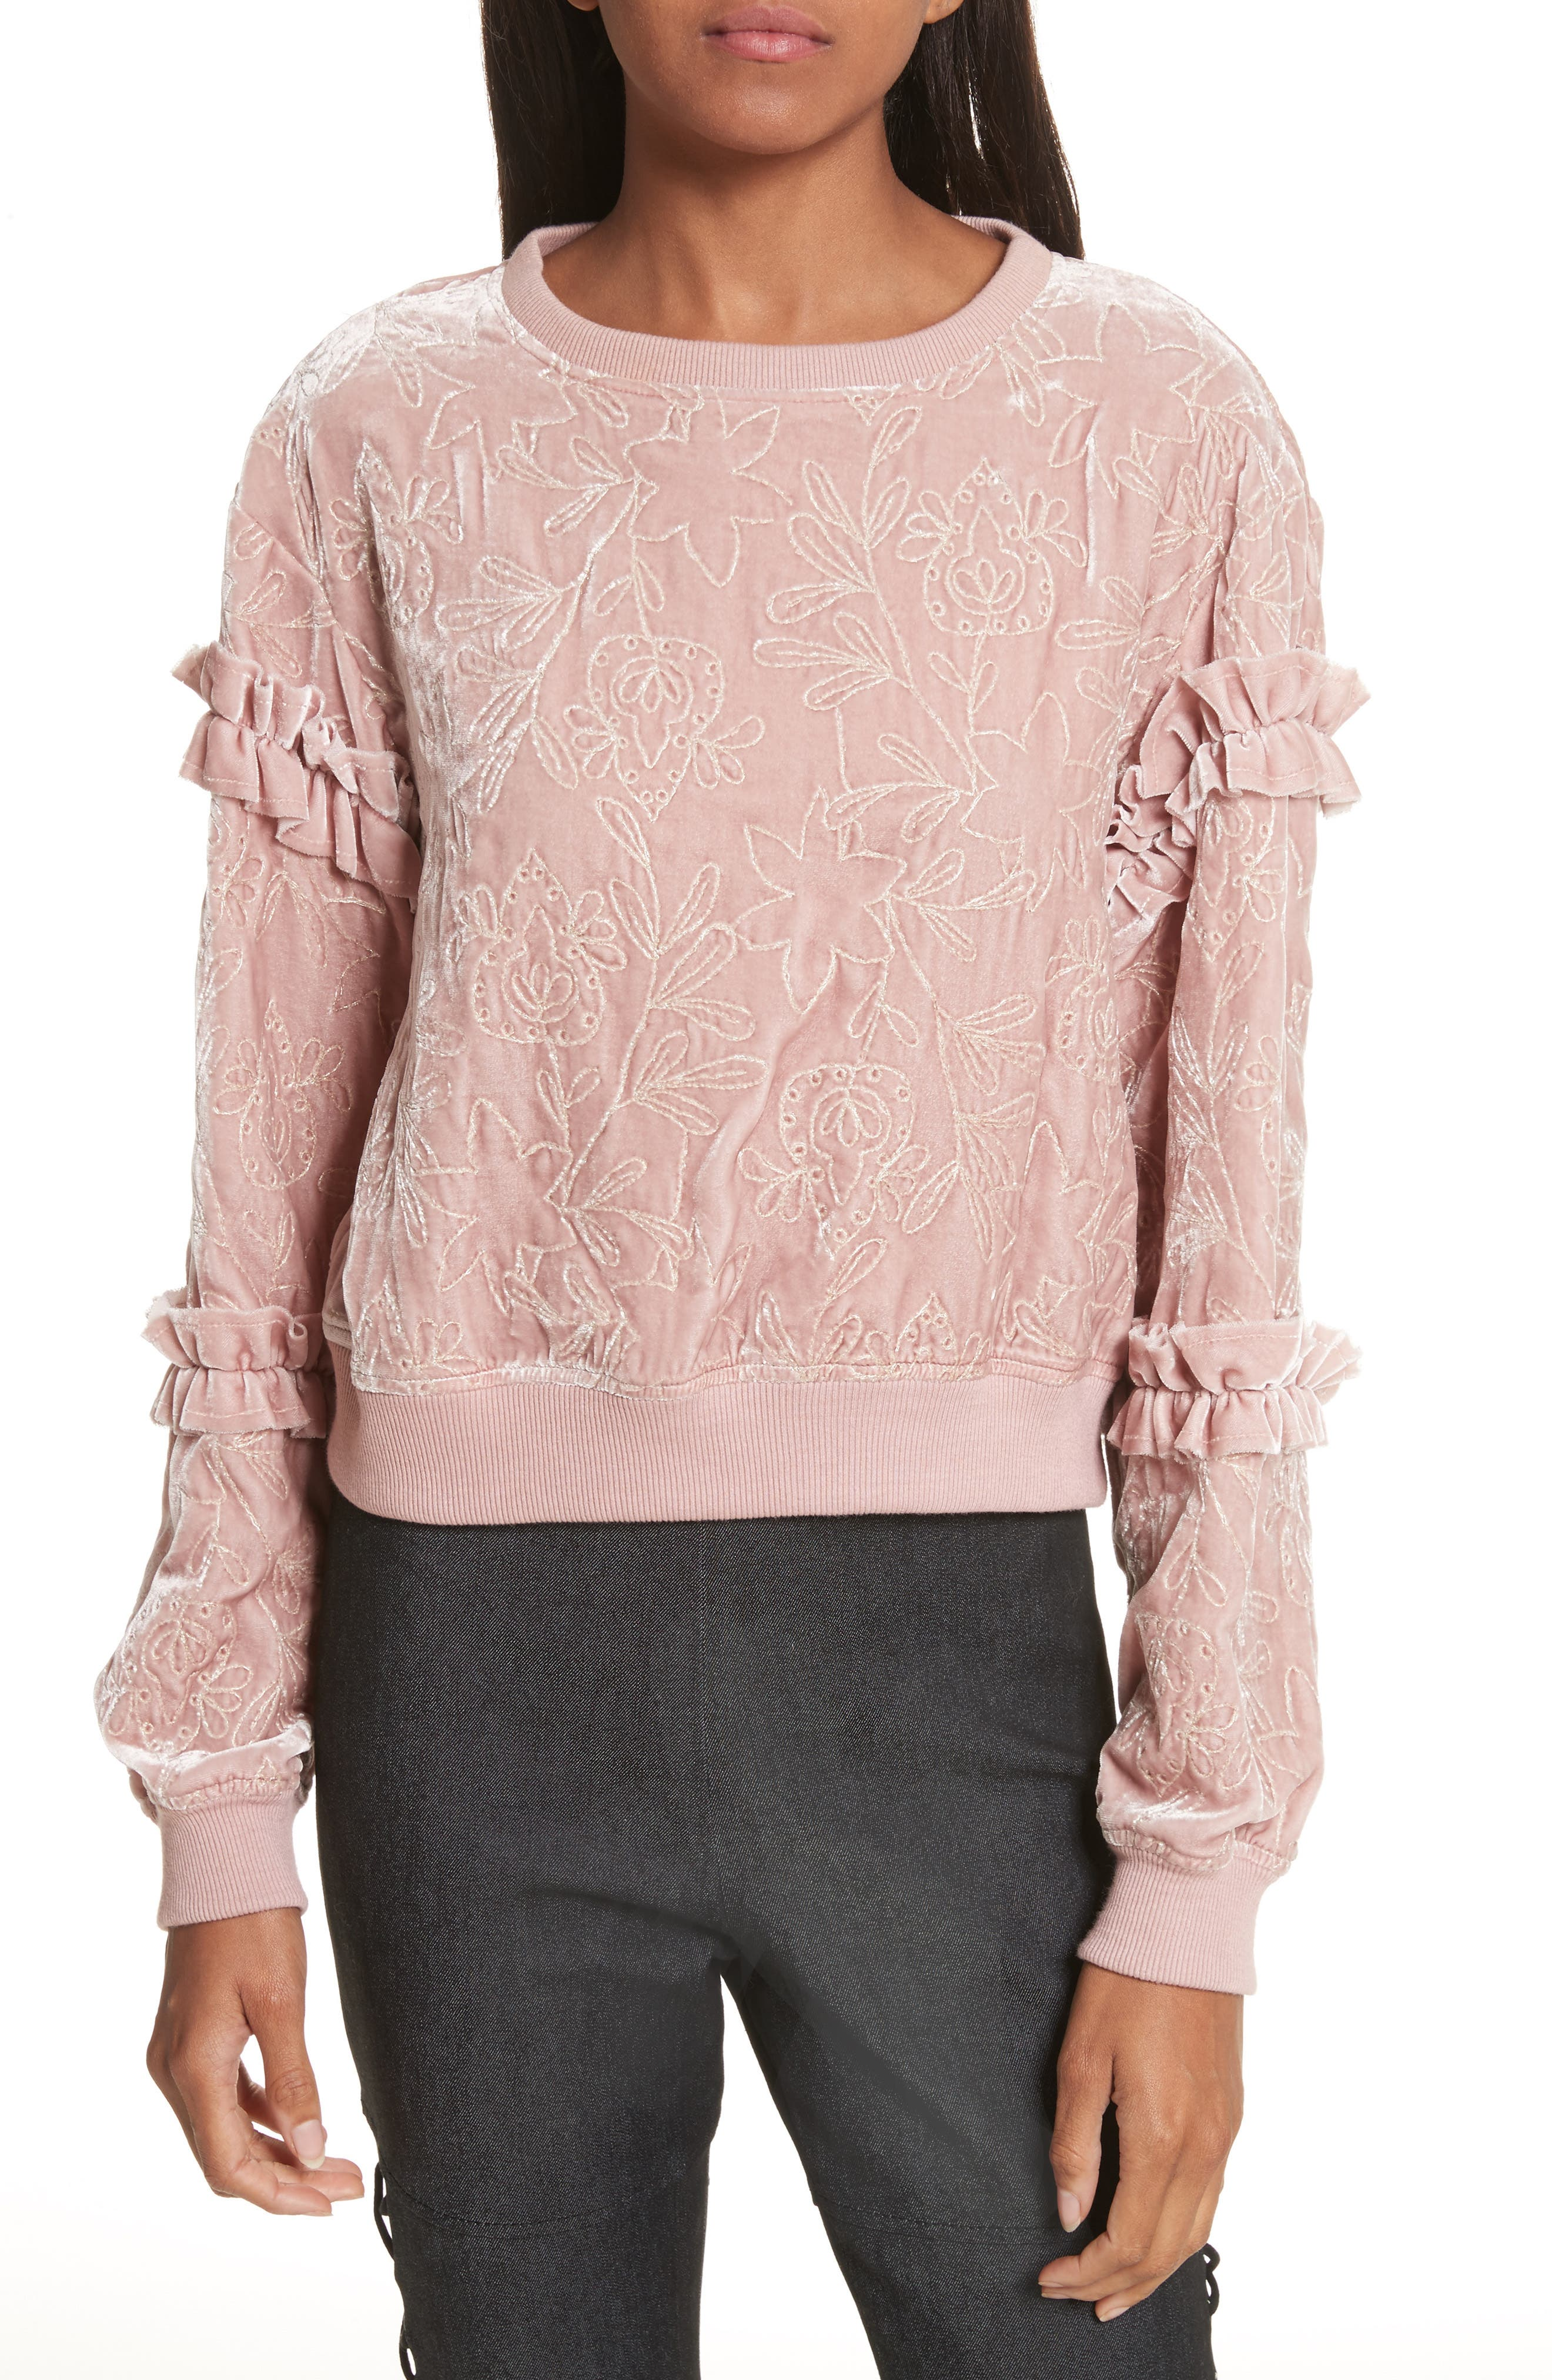 Nara Embroidered Velvet Sweatshirt,                             Main thumbnail 1, color,                             Mauve